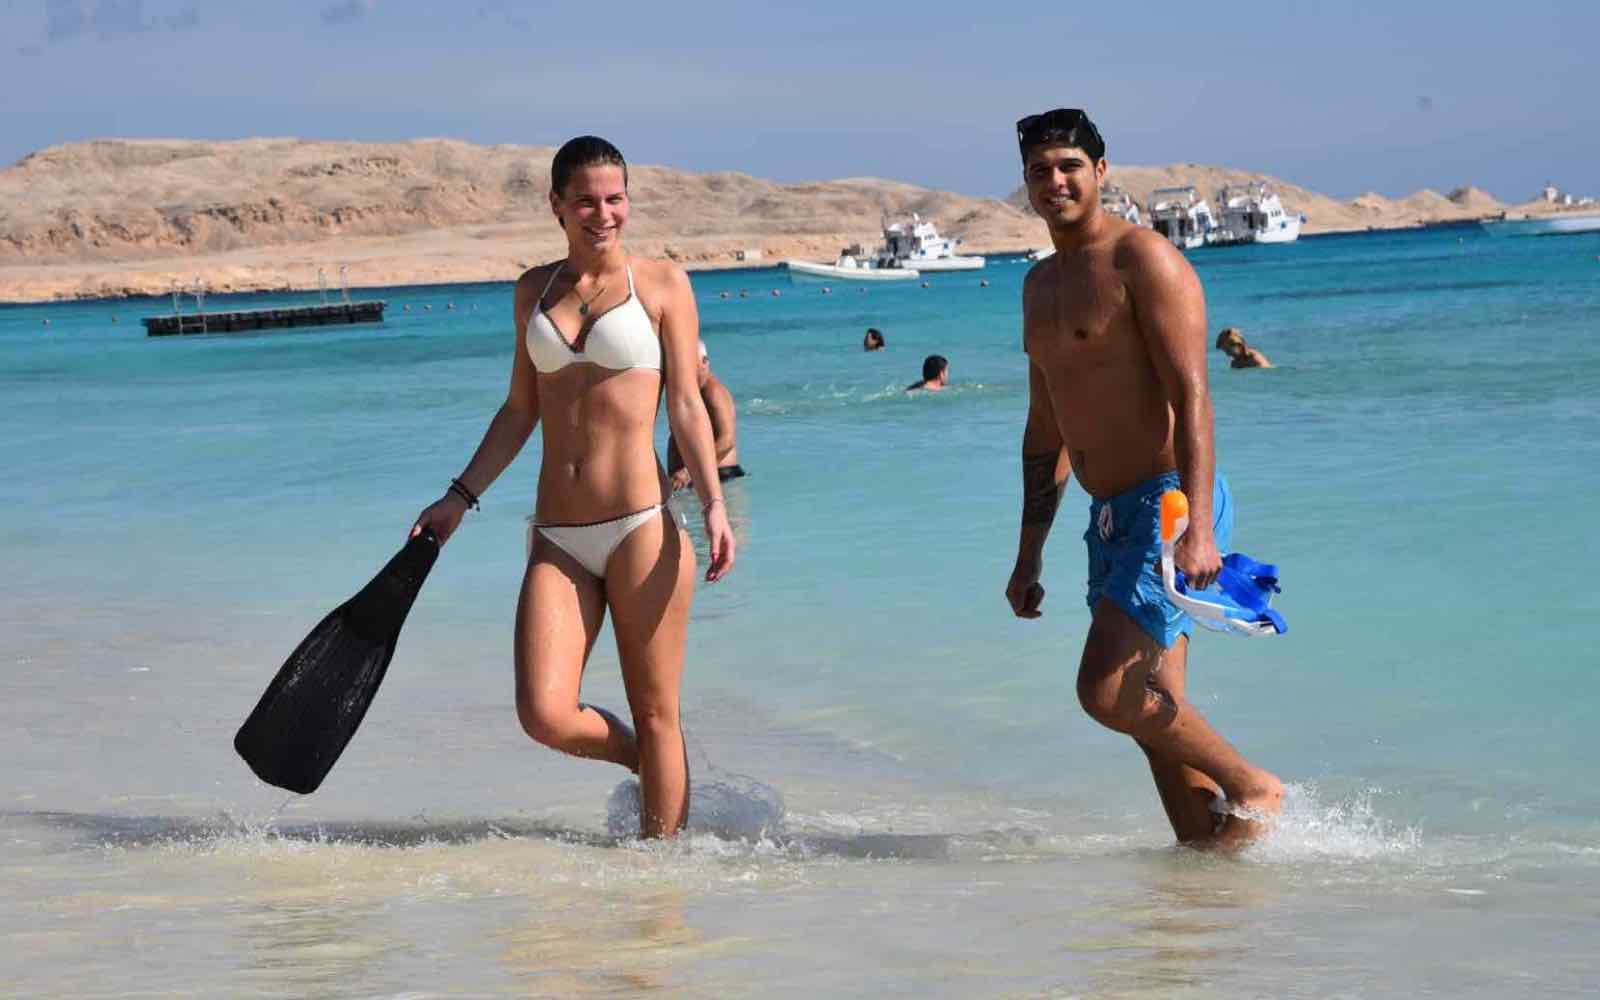 Life's a Beach on the Red Sea coast